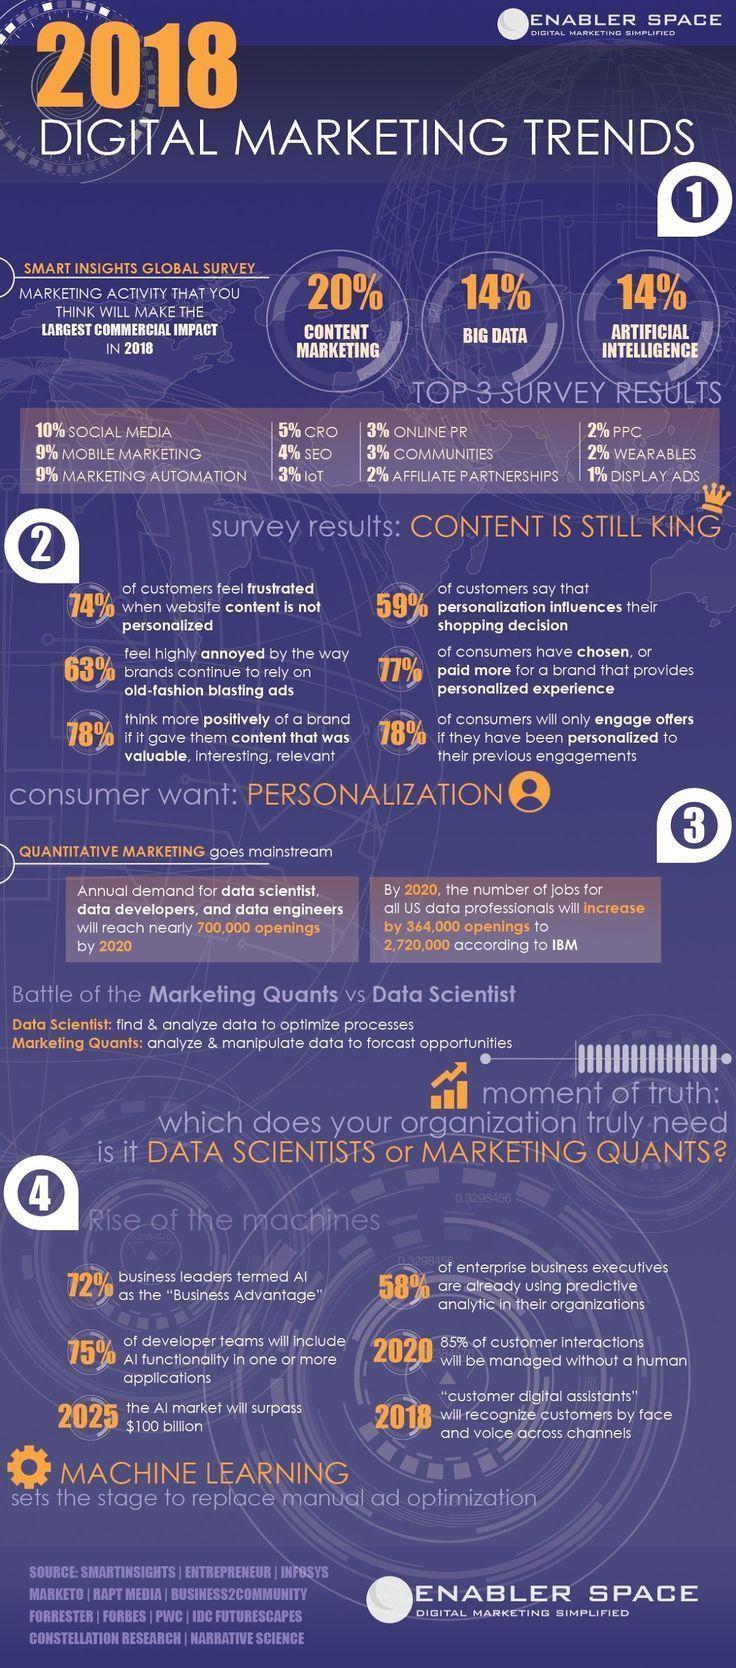 26e56a62ae13c  Infographic  2018 Digital Marketing Trends and Statistics   InternetMarketing Marketing Strategies